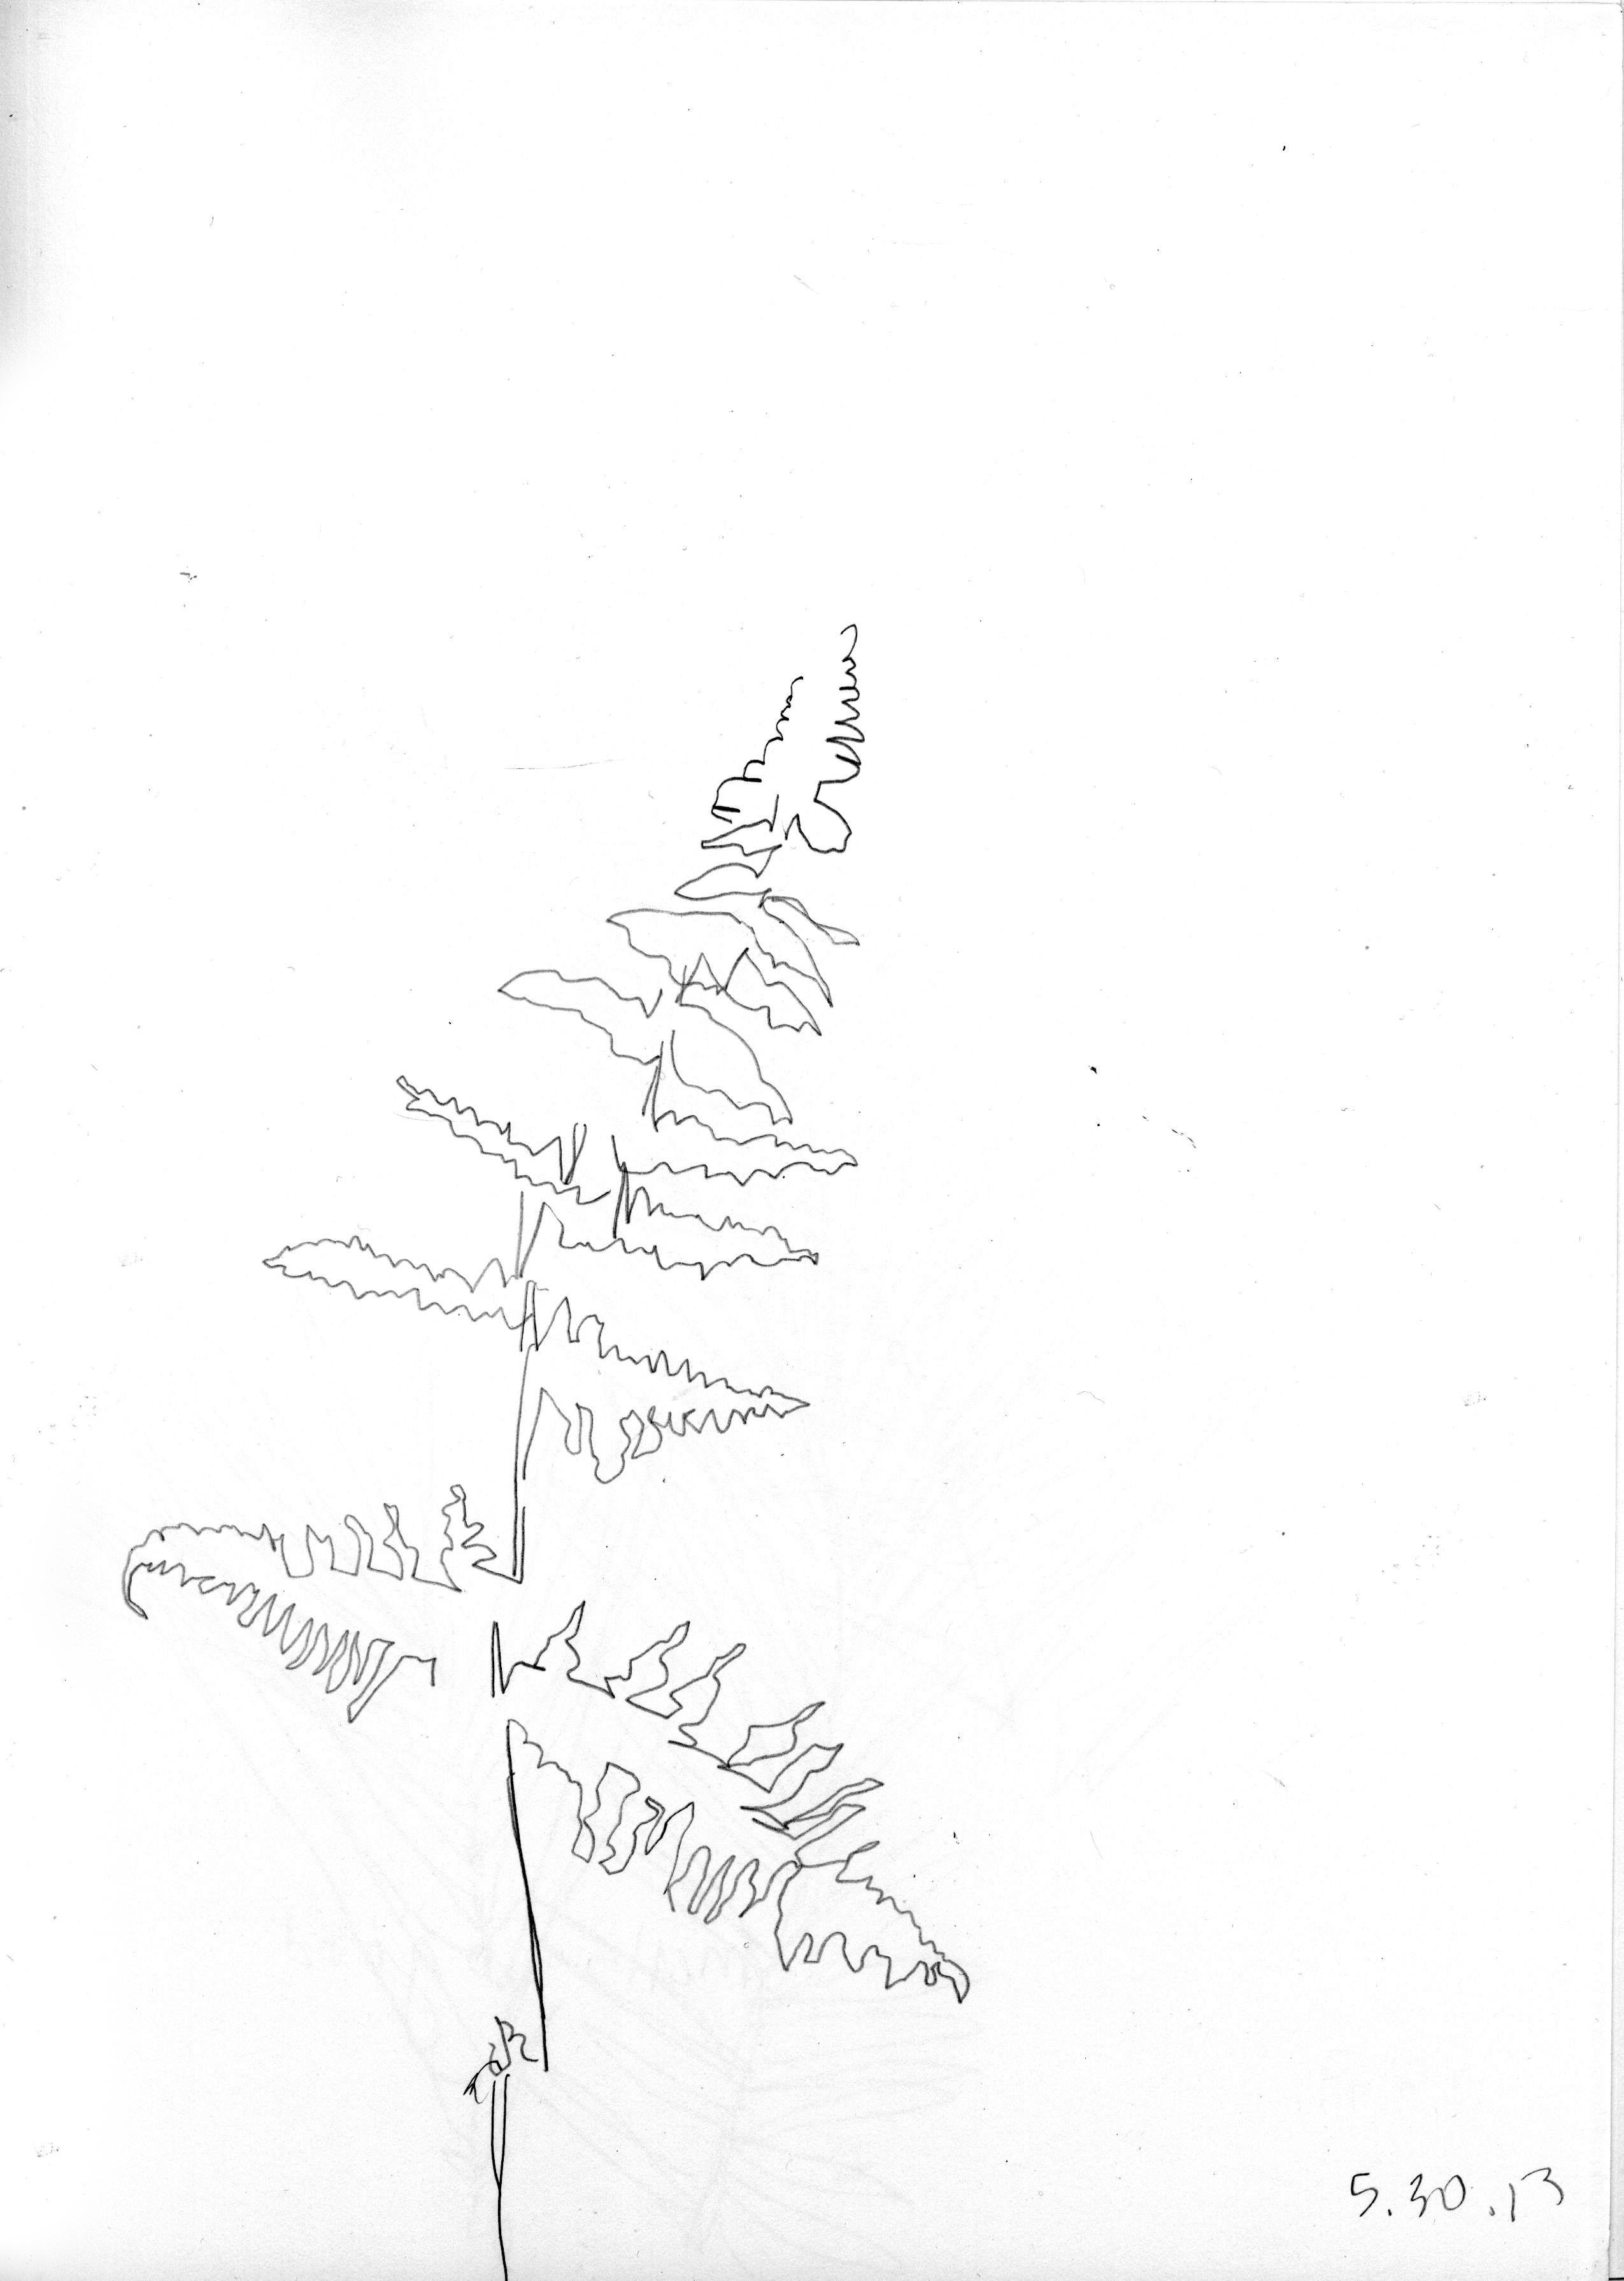 Gibson fern